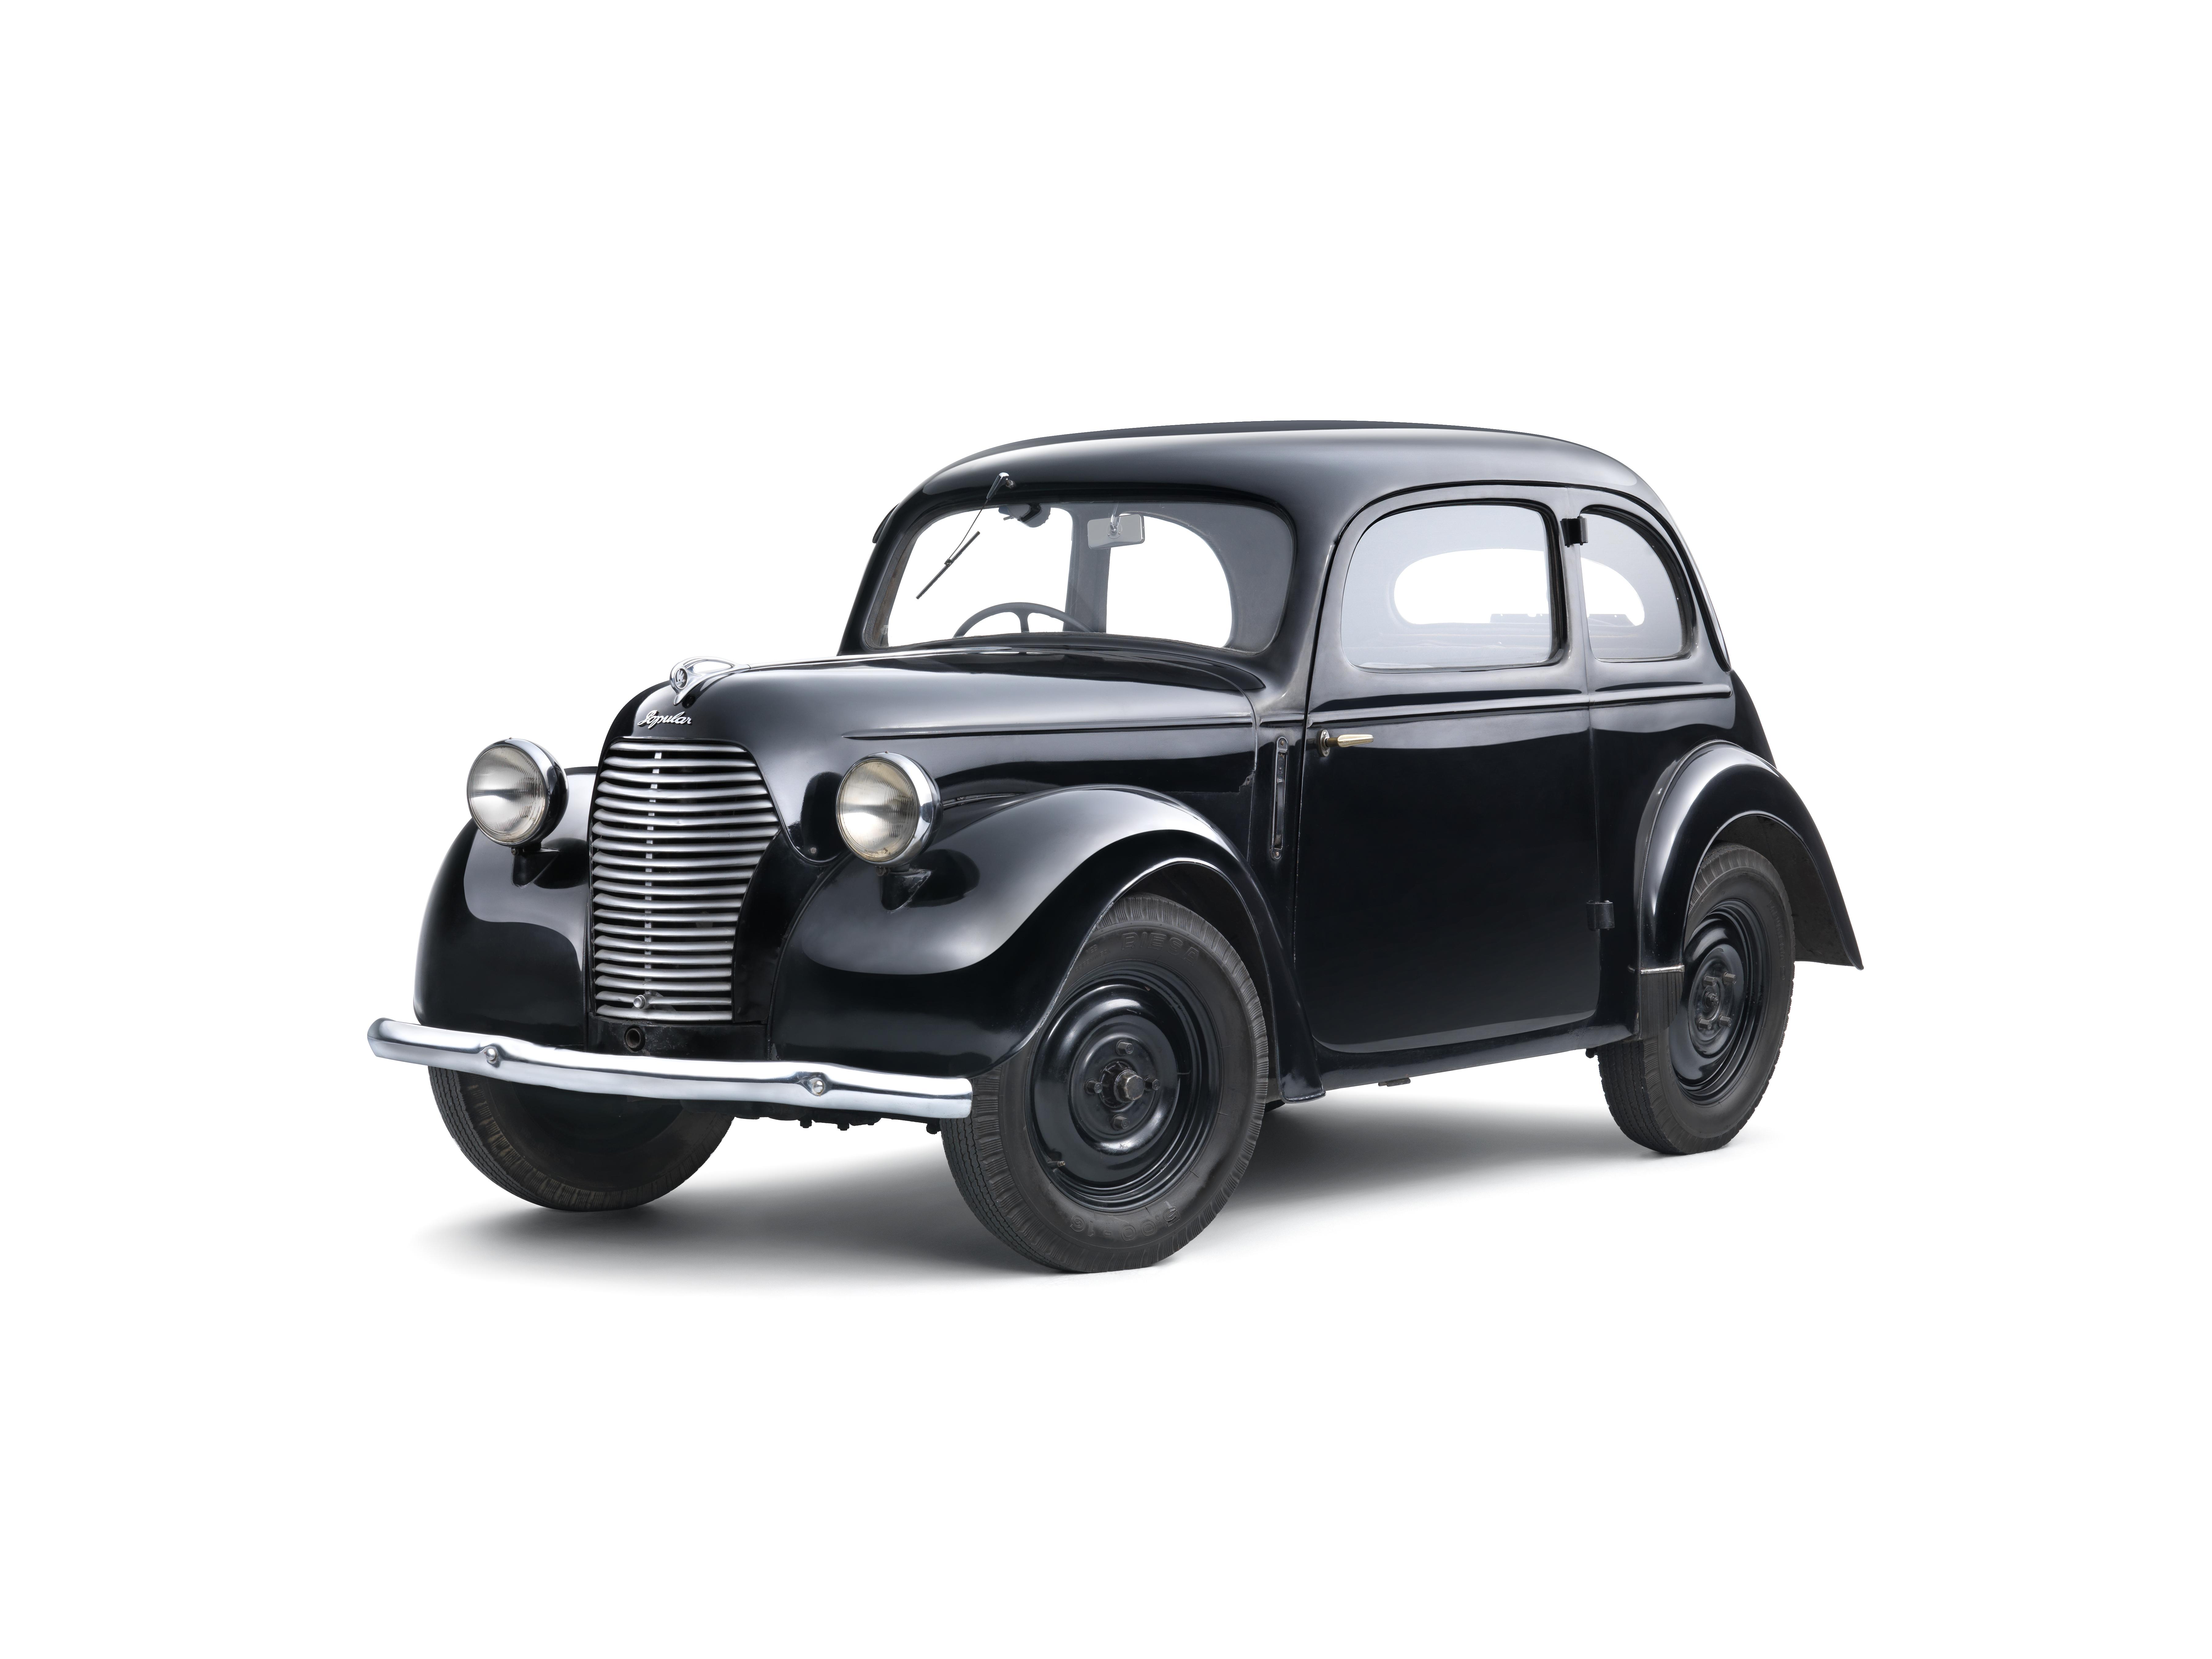 Lesser-known models from SKODA AUTO's 125-year history: The SKODA SAGITTA - Image 1